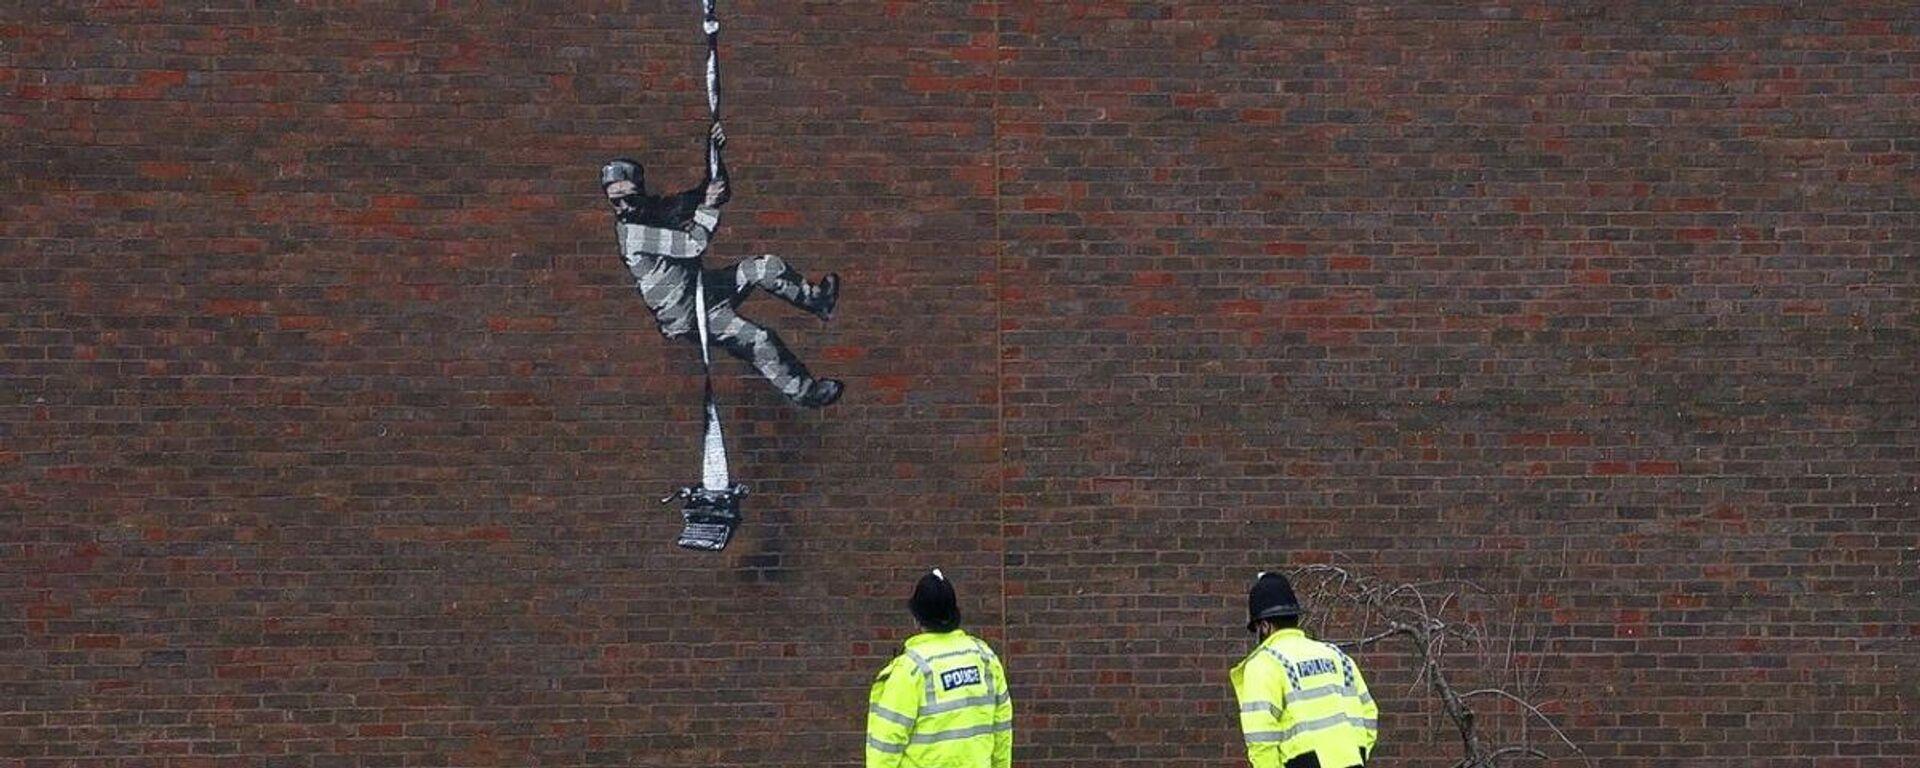 El grafiti de Banksy en la pared de la cárcel de Reading - Sputnik Mundo, 1920, 05.03.2021